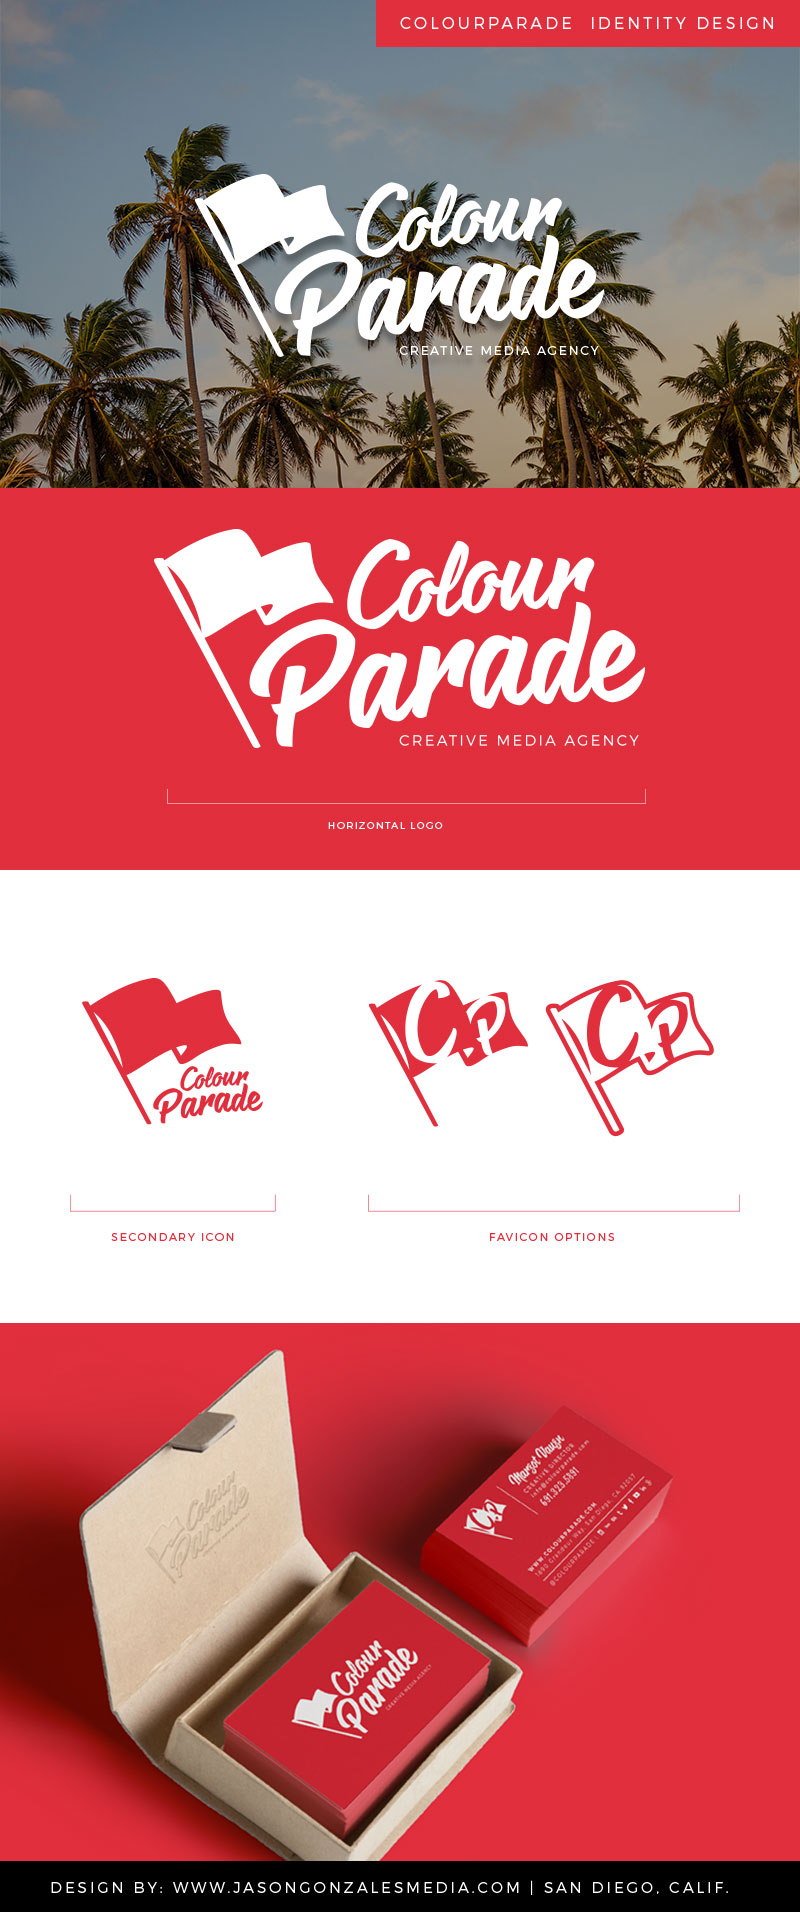 ColourParade_Identity-Design_v02.jpg